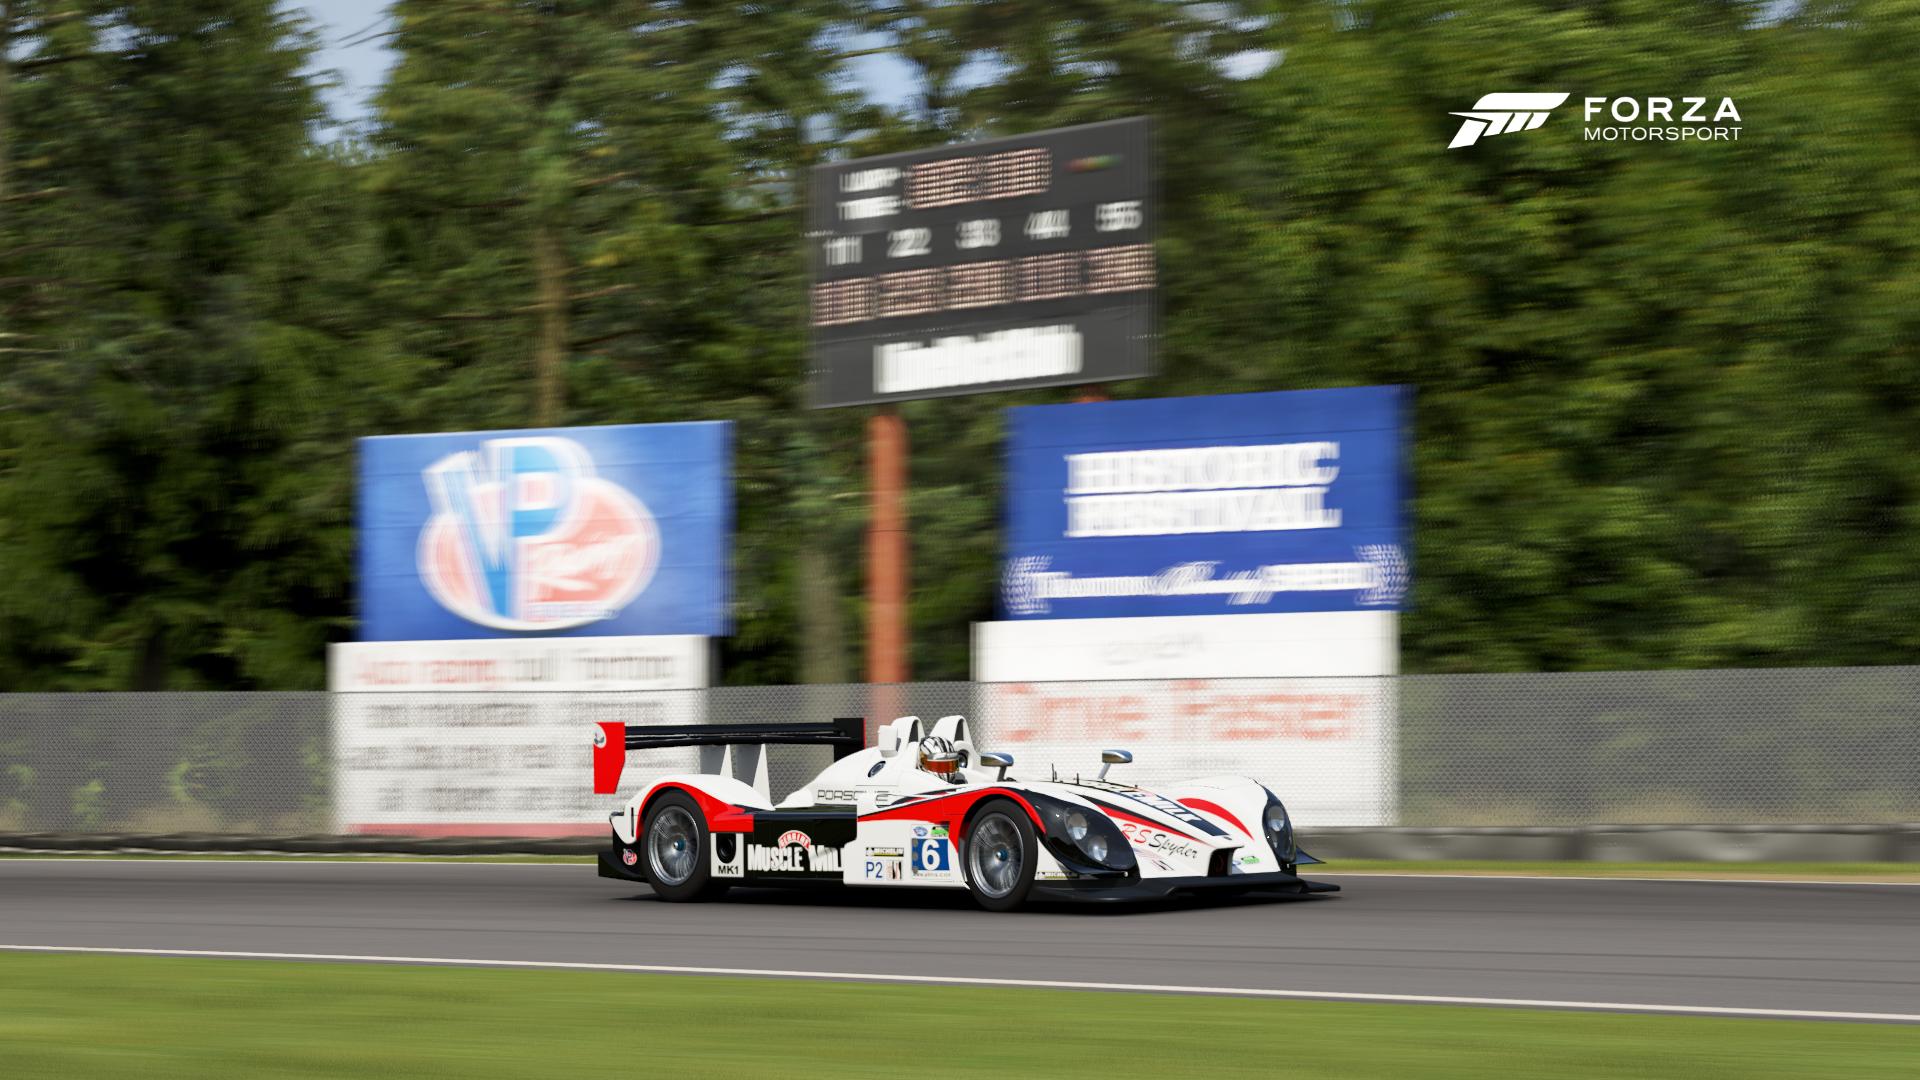 Forza Motorsport 6 (45).png